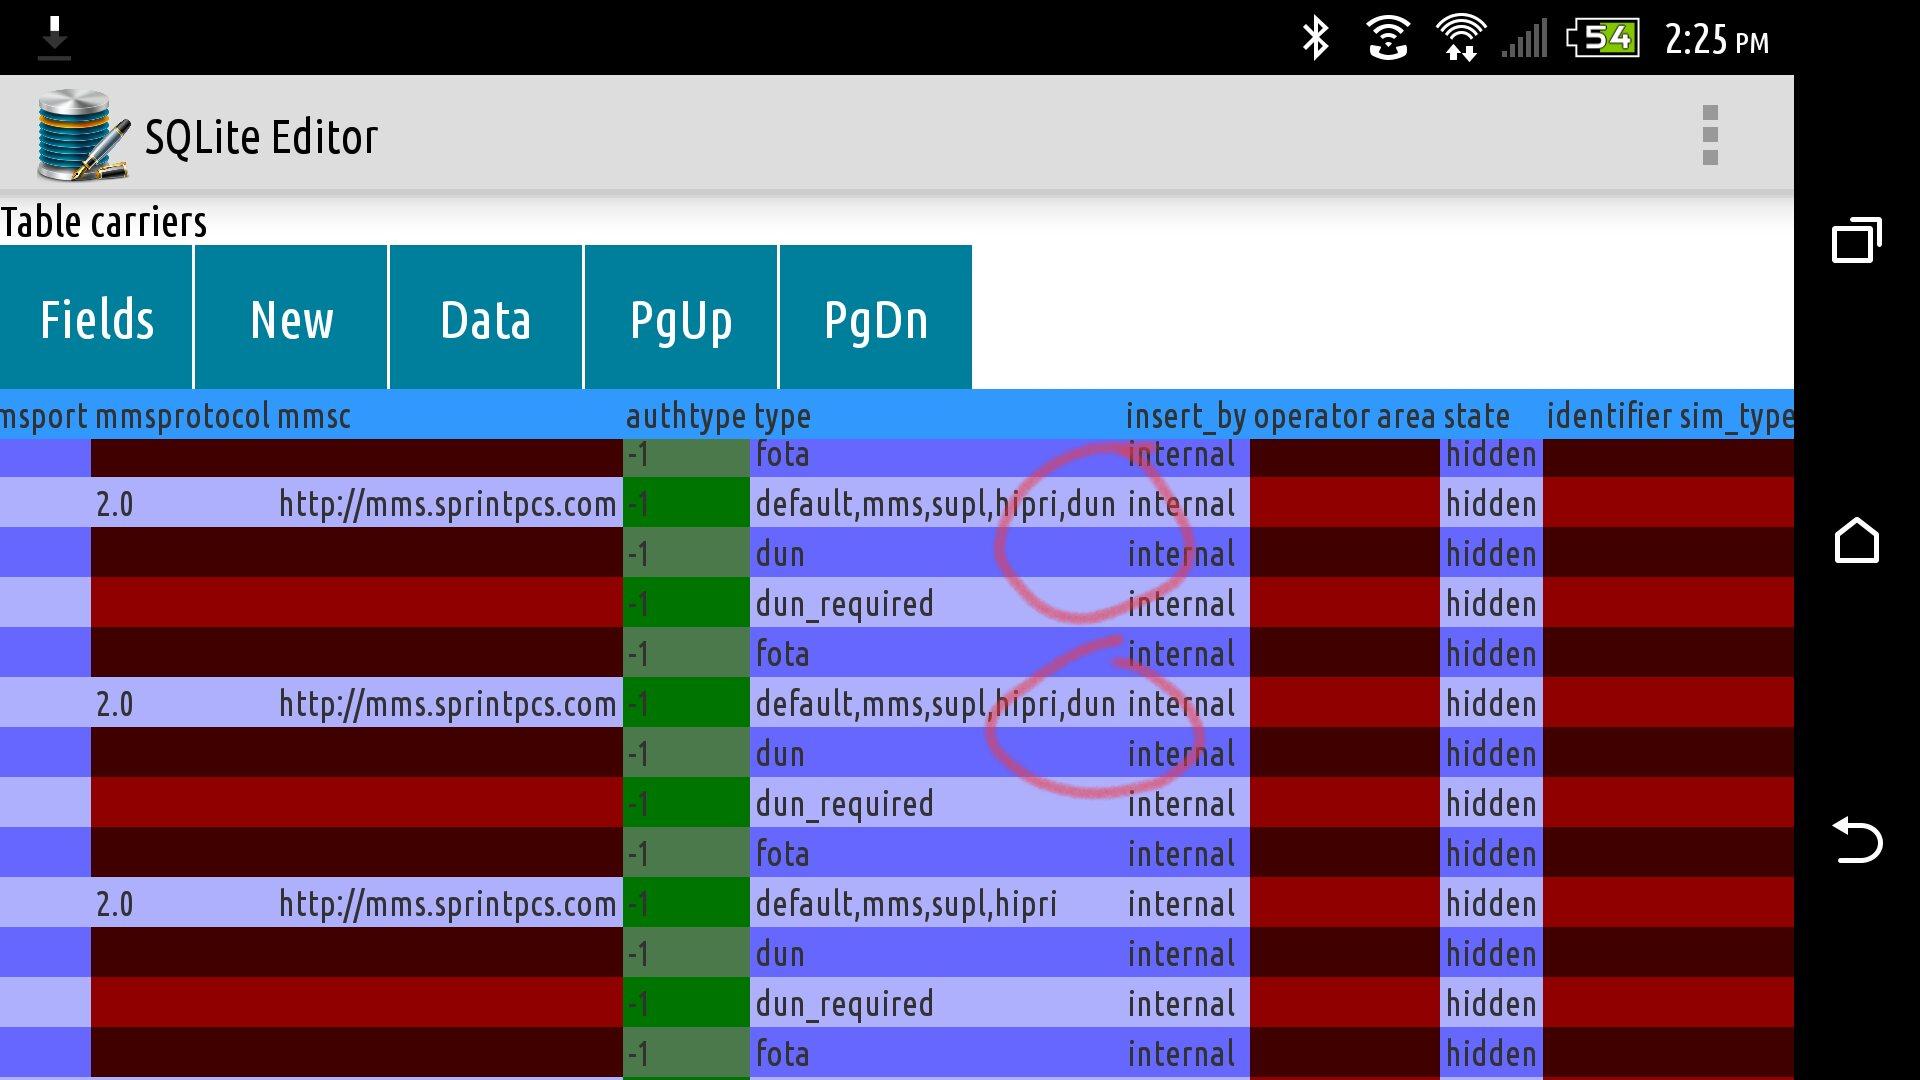 http://forum.xda-developers.com/attachment.php?attachmentid=3331390&d=1432582313